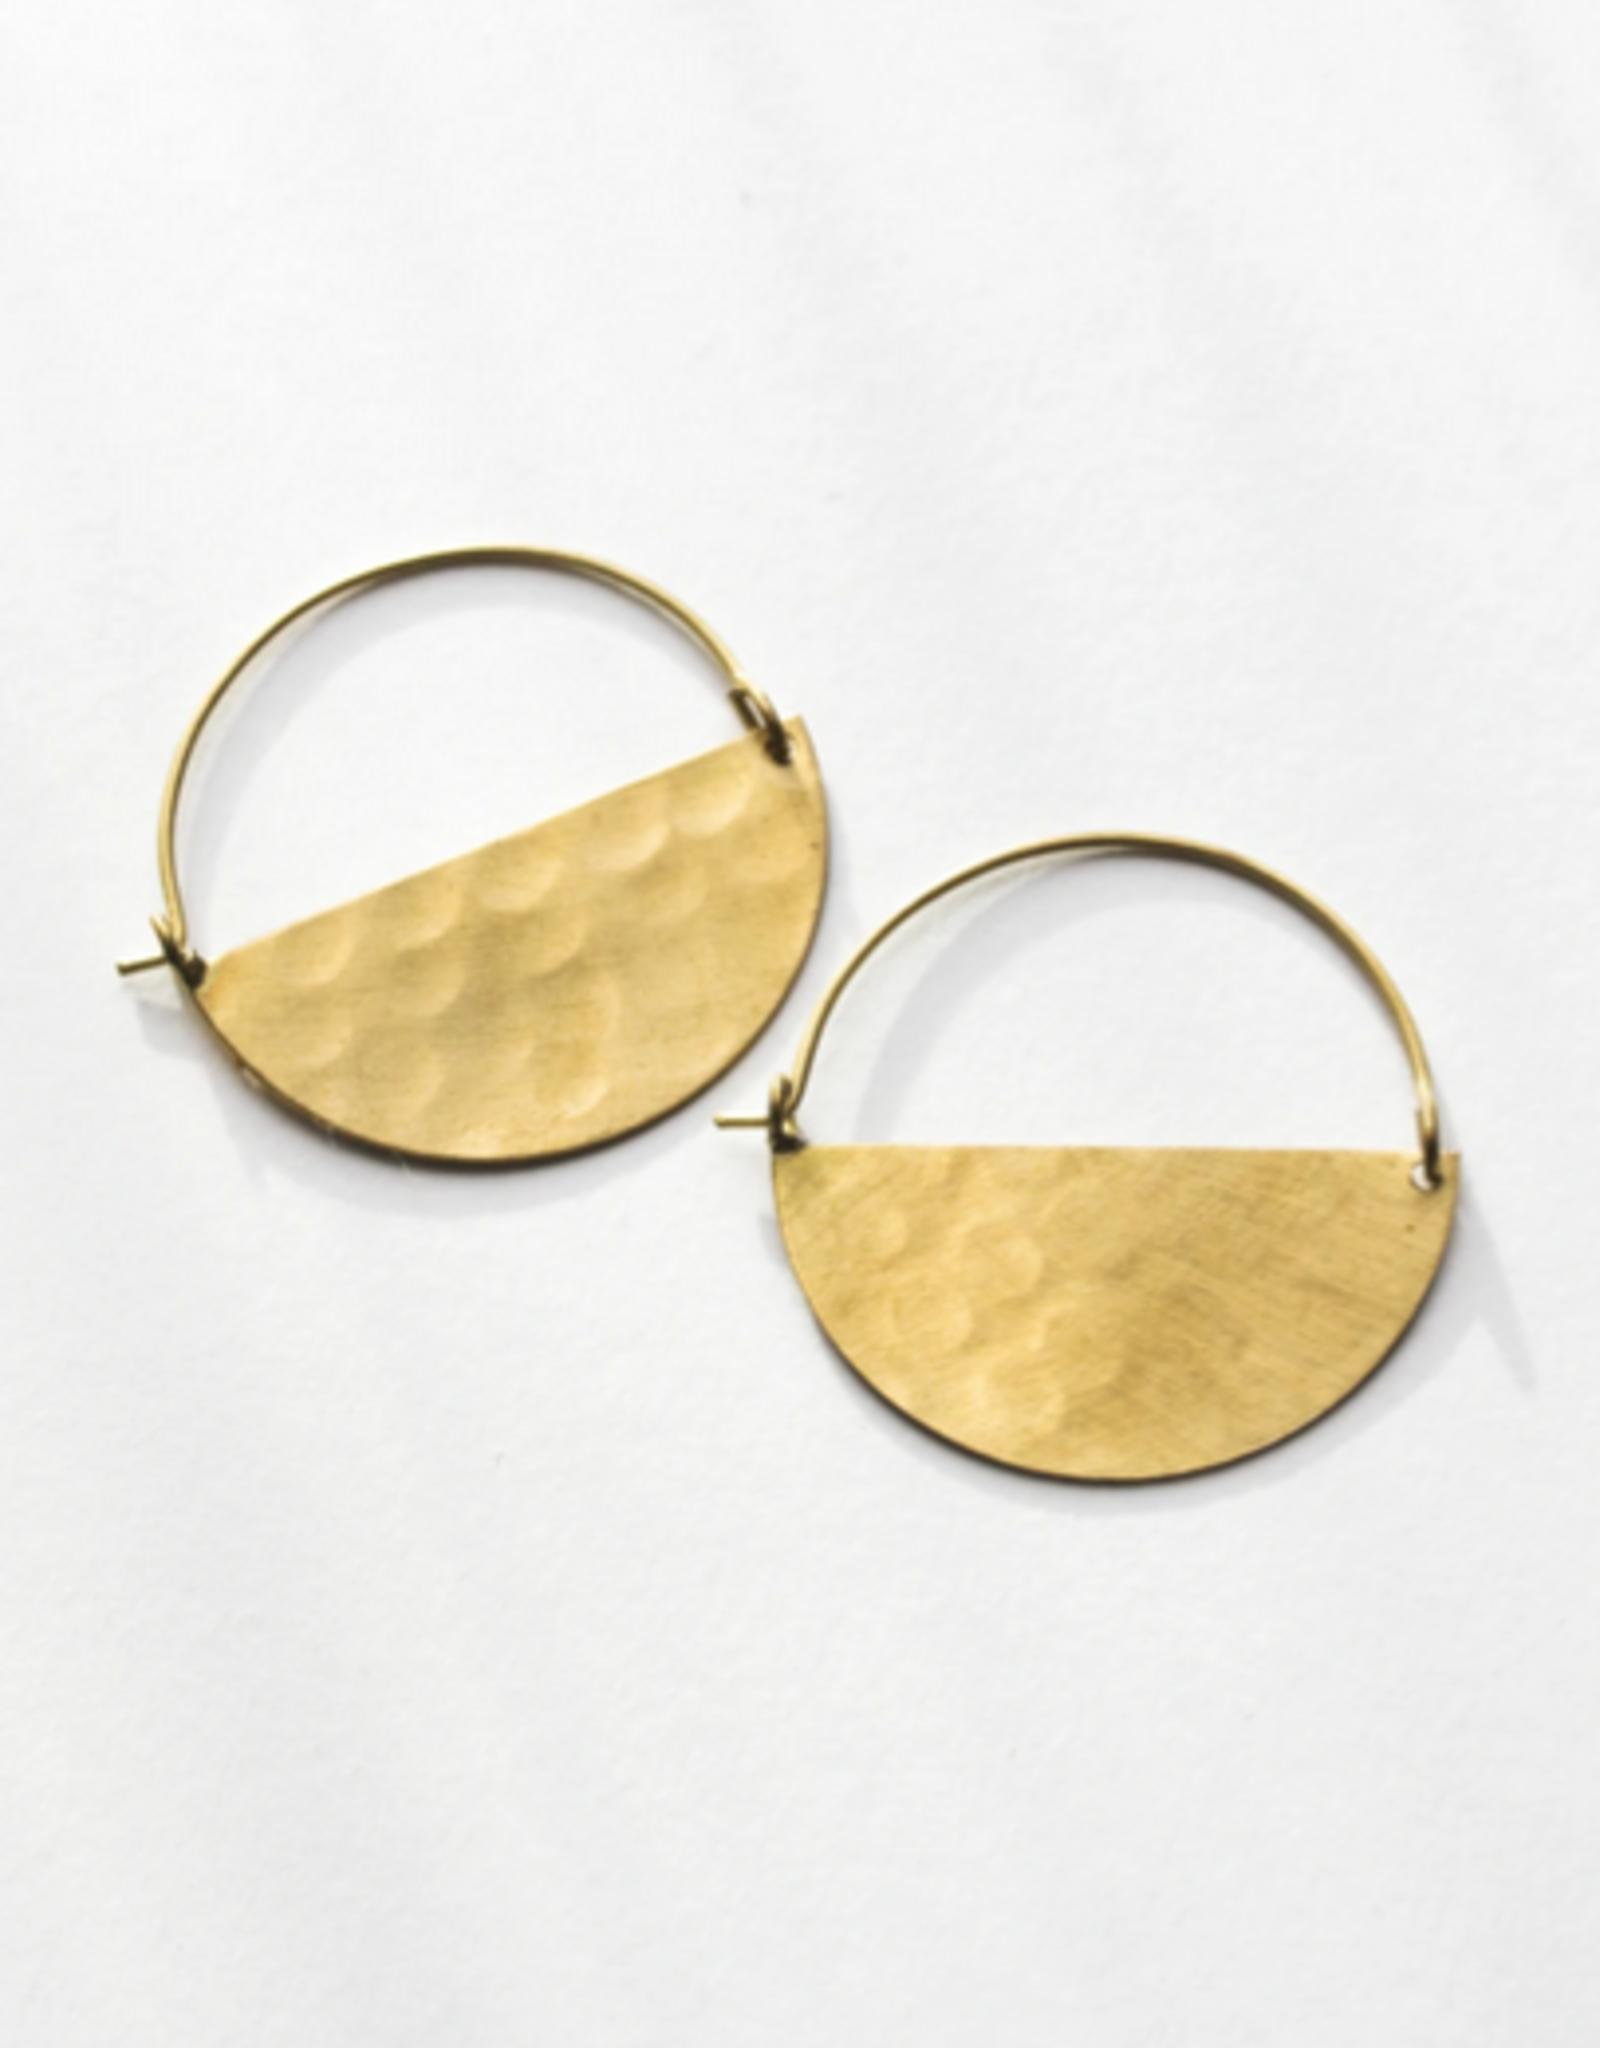 Rover & Kin Rover & Kin | Half Moon Earrings